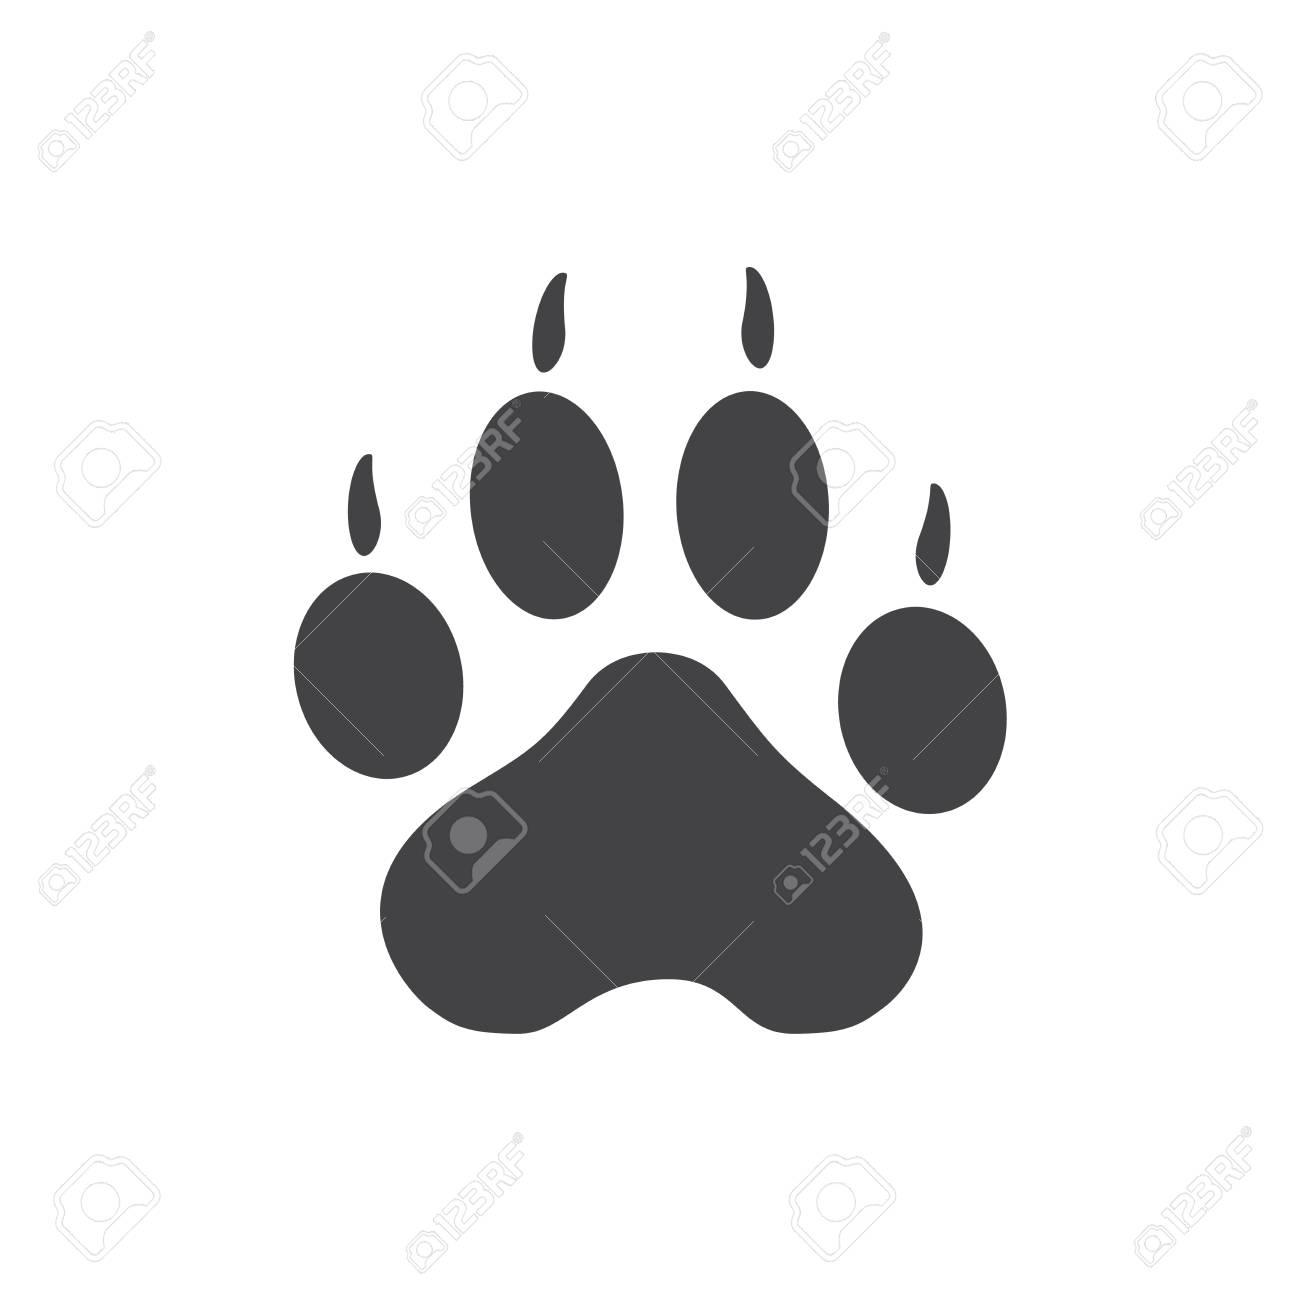 be0fac853a09 Tiger Paw Prints Logo. Black on White background. Animal paw print